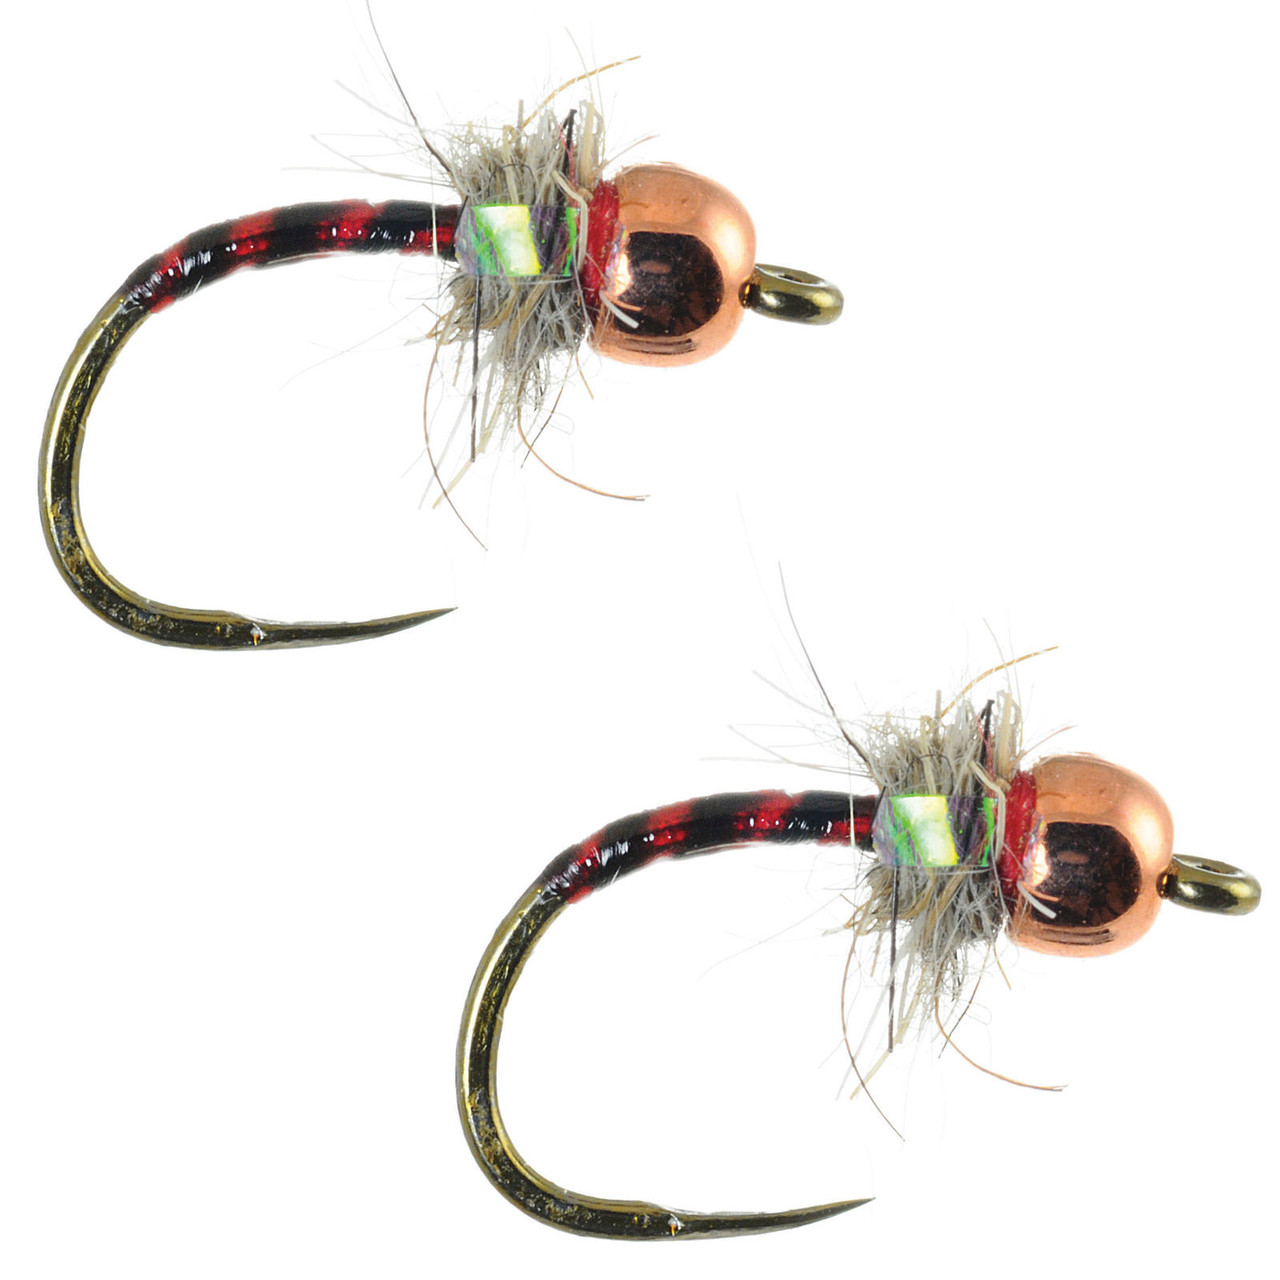 Umpqua Iron Lotus Egan/'s Olive Tungsten 2 Pack Nymph Fly Fishing Flies